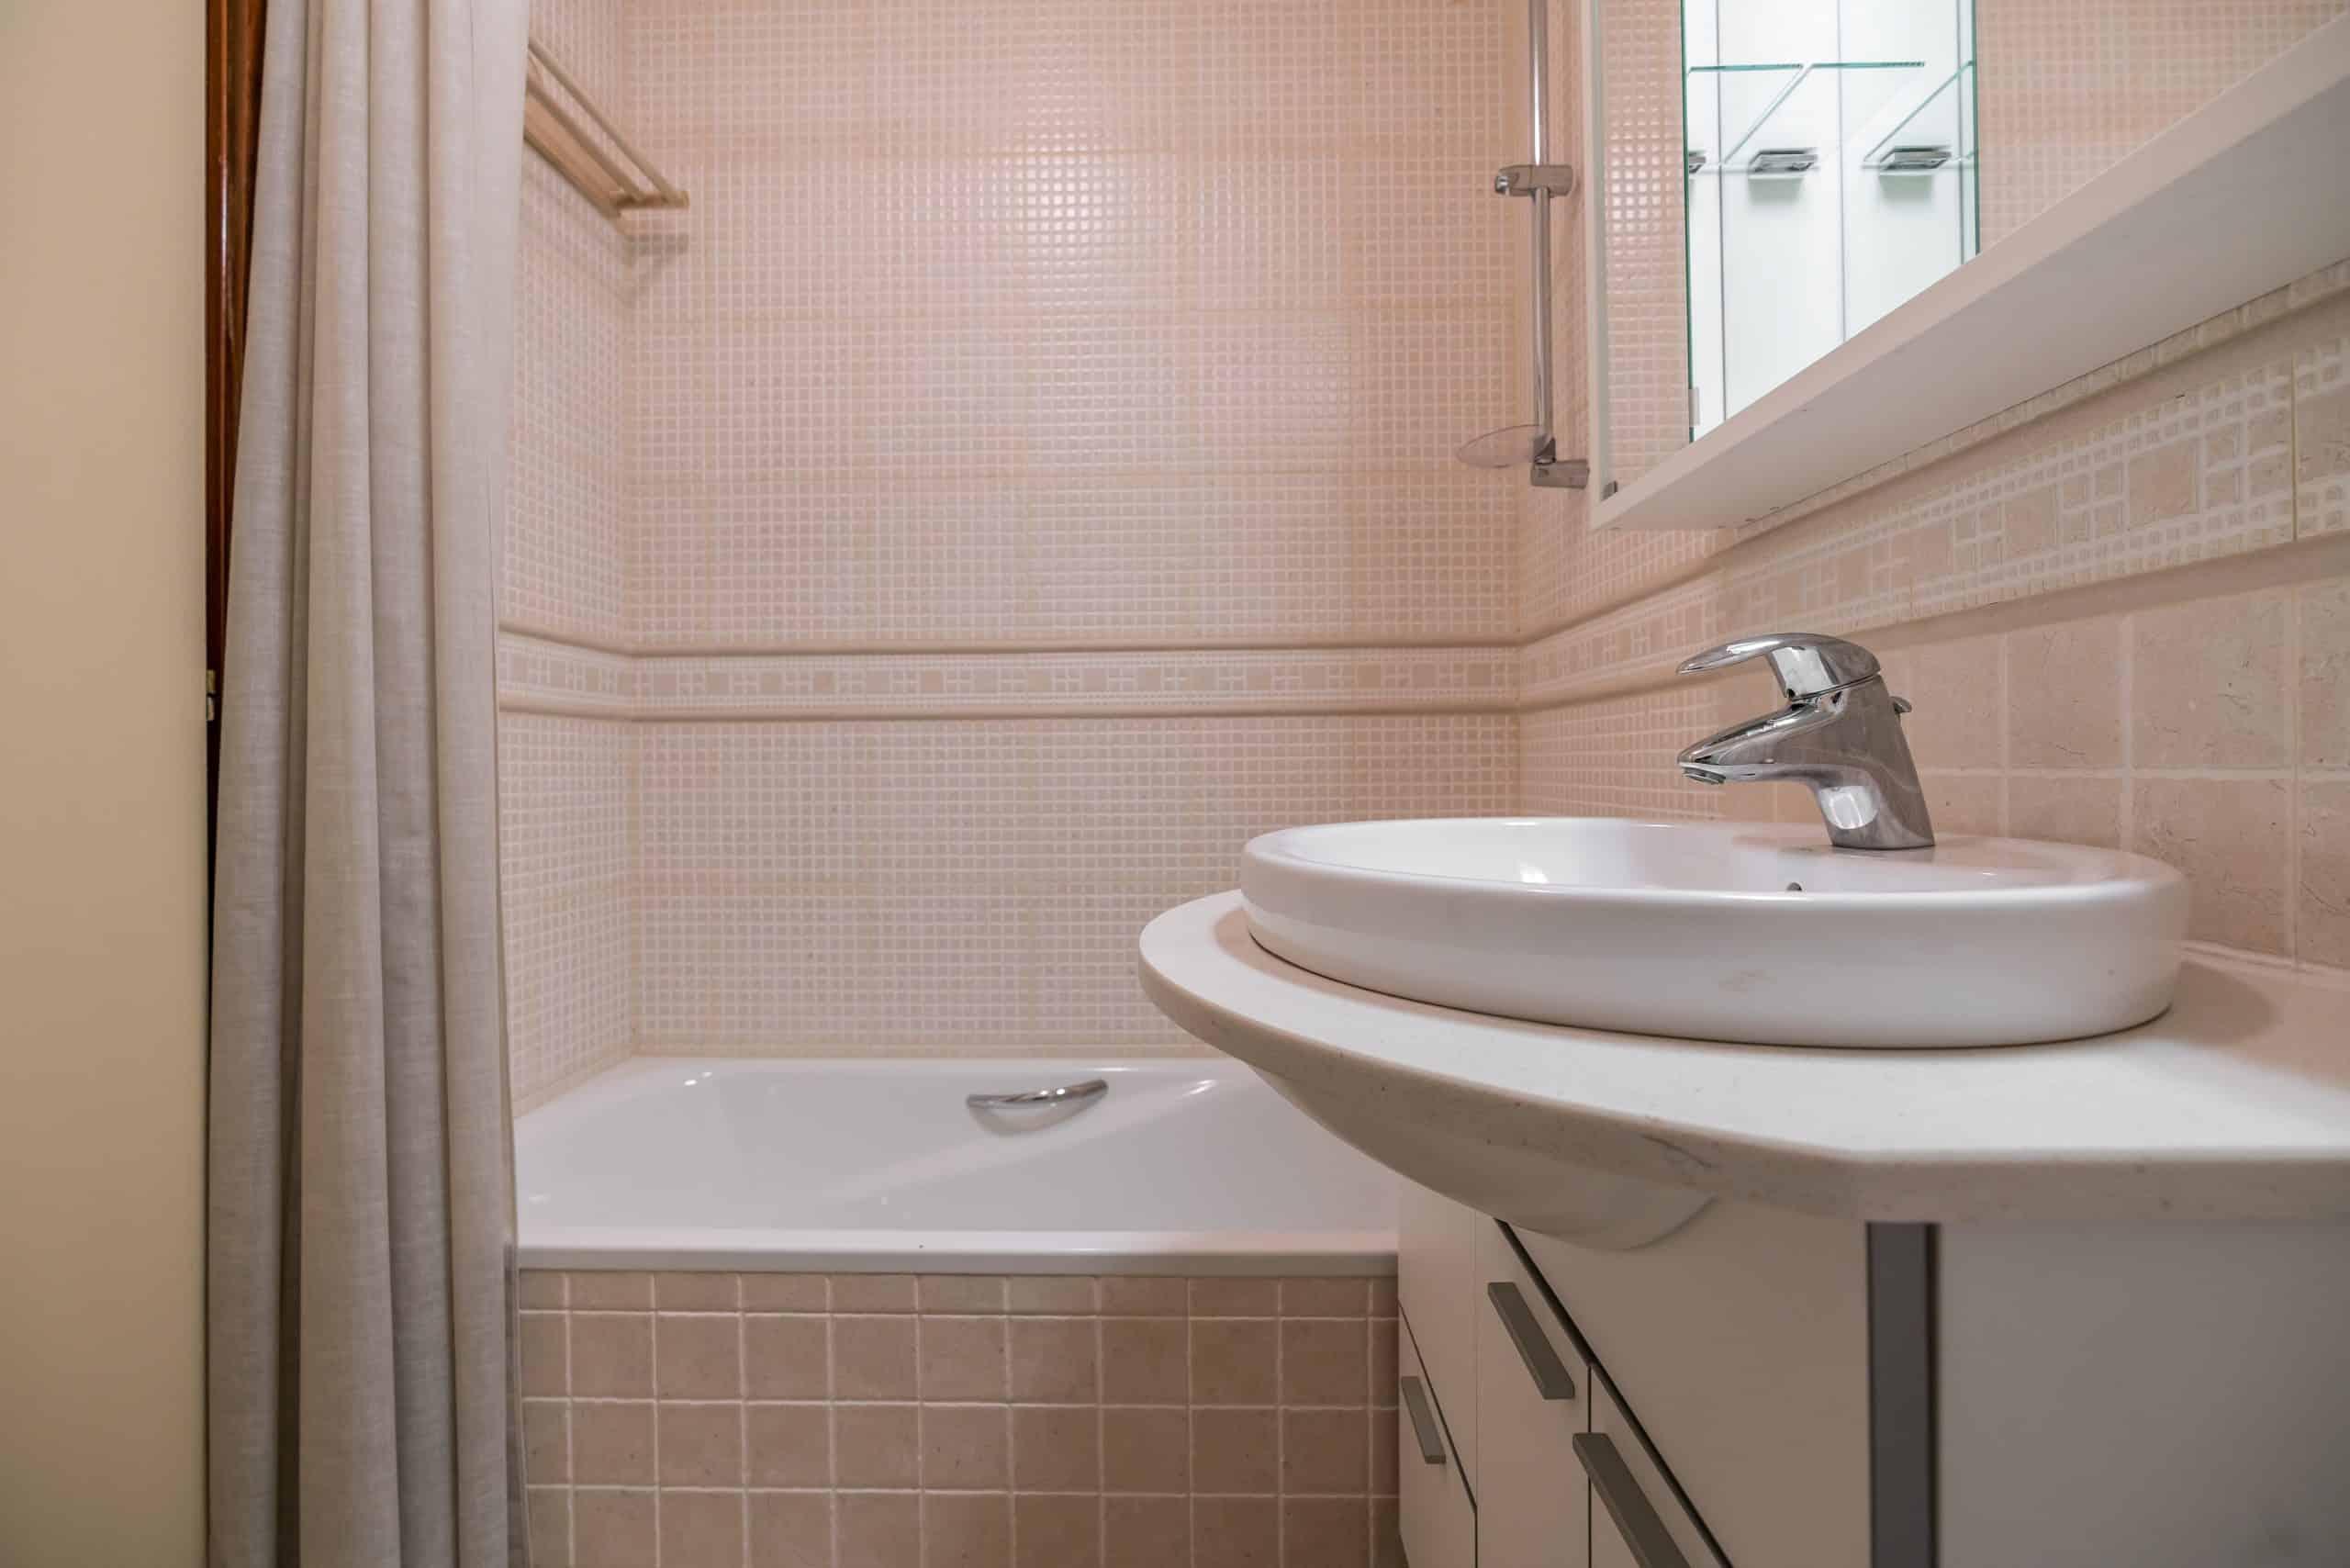 Agencia Inmobiliaria de Madrid-FUTUROCASA-Zona ARGANZUELA-EMBAJADORES-LEGAZPI -calle Embajadores- baño 136